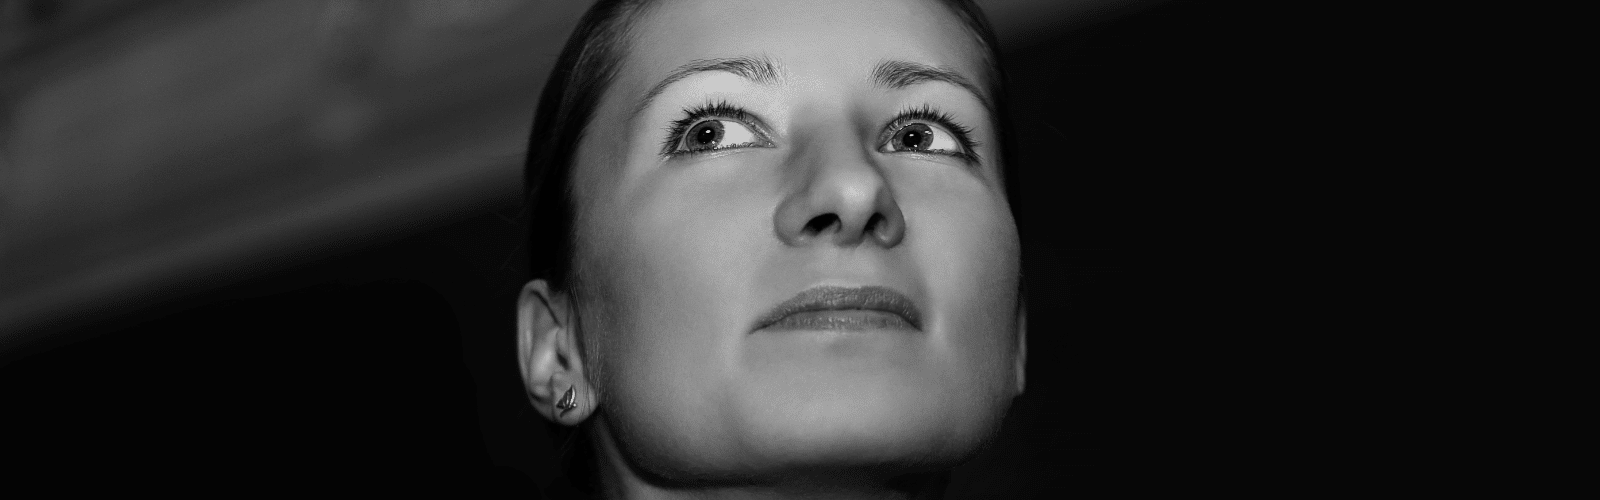 Karolina Adamska-Woźniak   Inspirujące liderki i liderzy